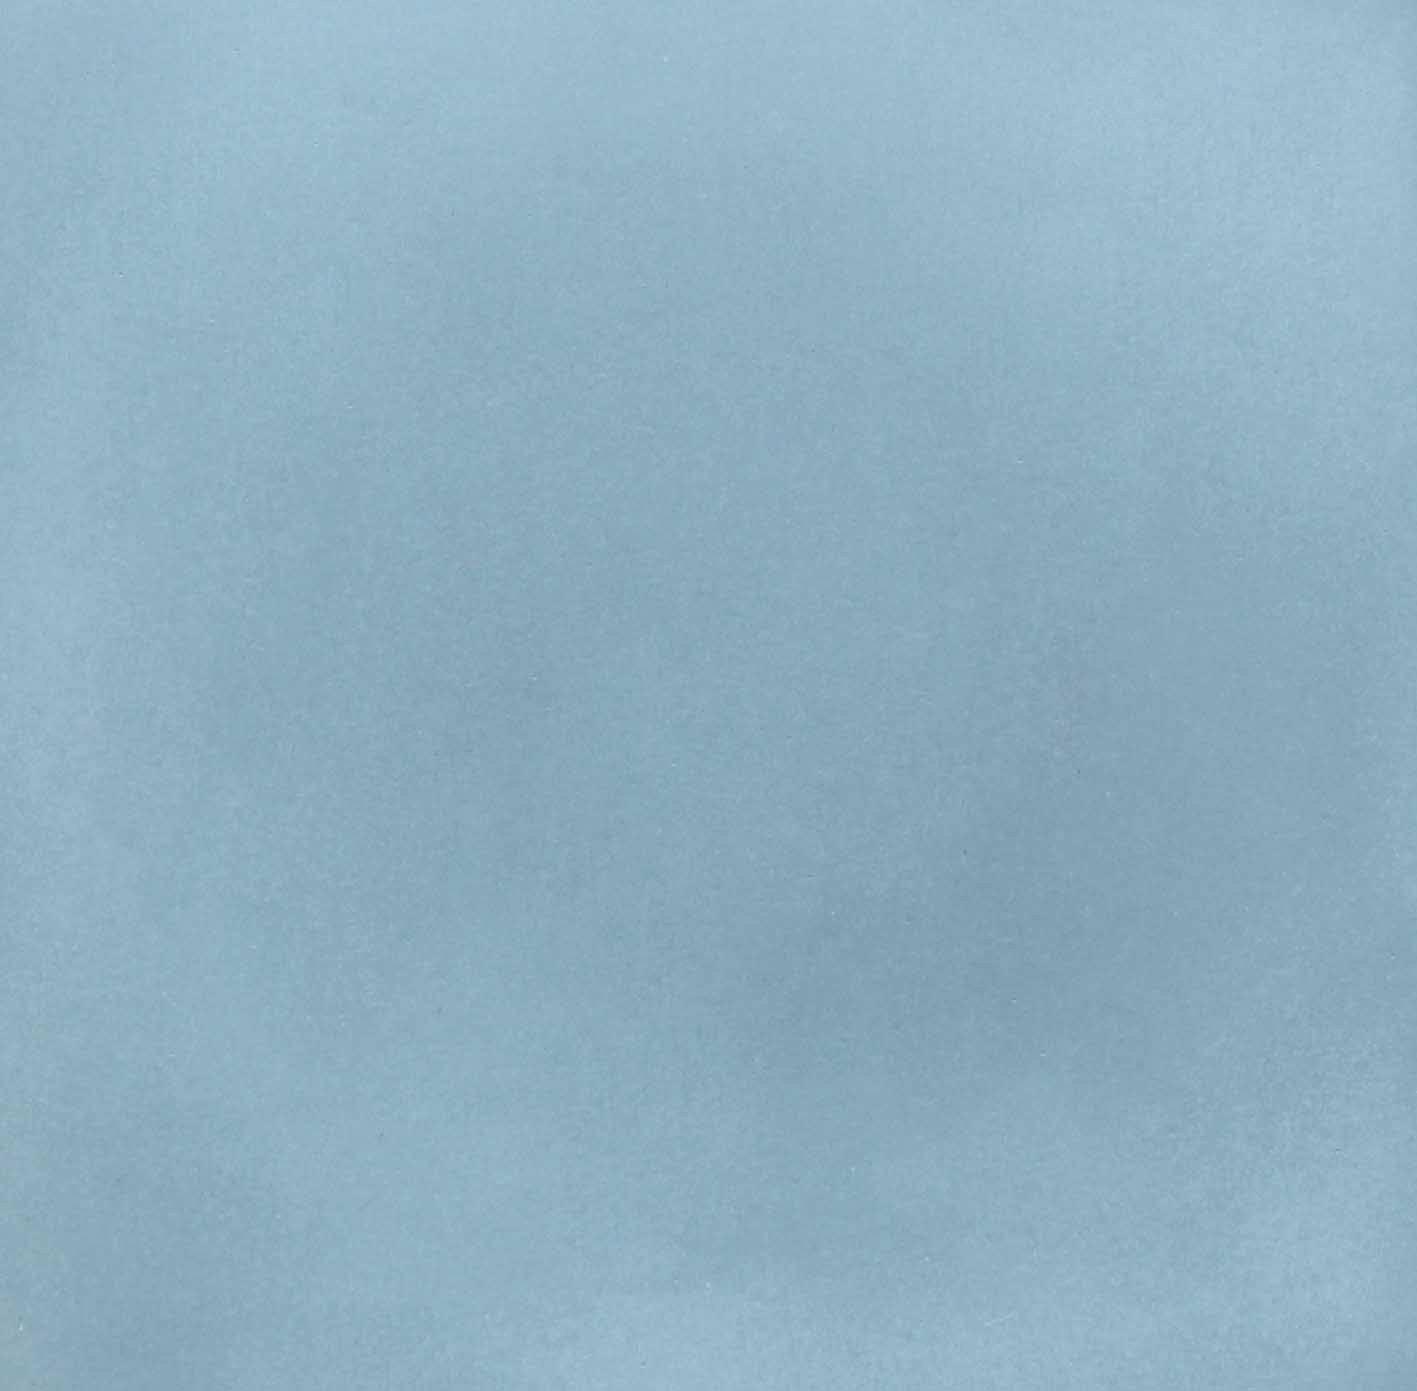 »Cement wall tile unicoloured blue-grey 07« von Replicata - 100 x 100 x 13 mm - Replikate